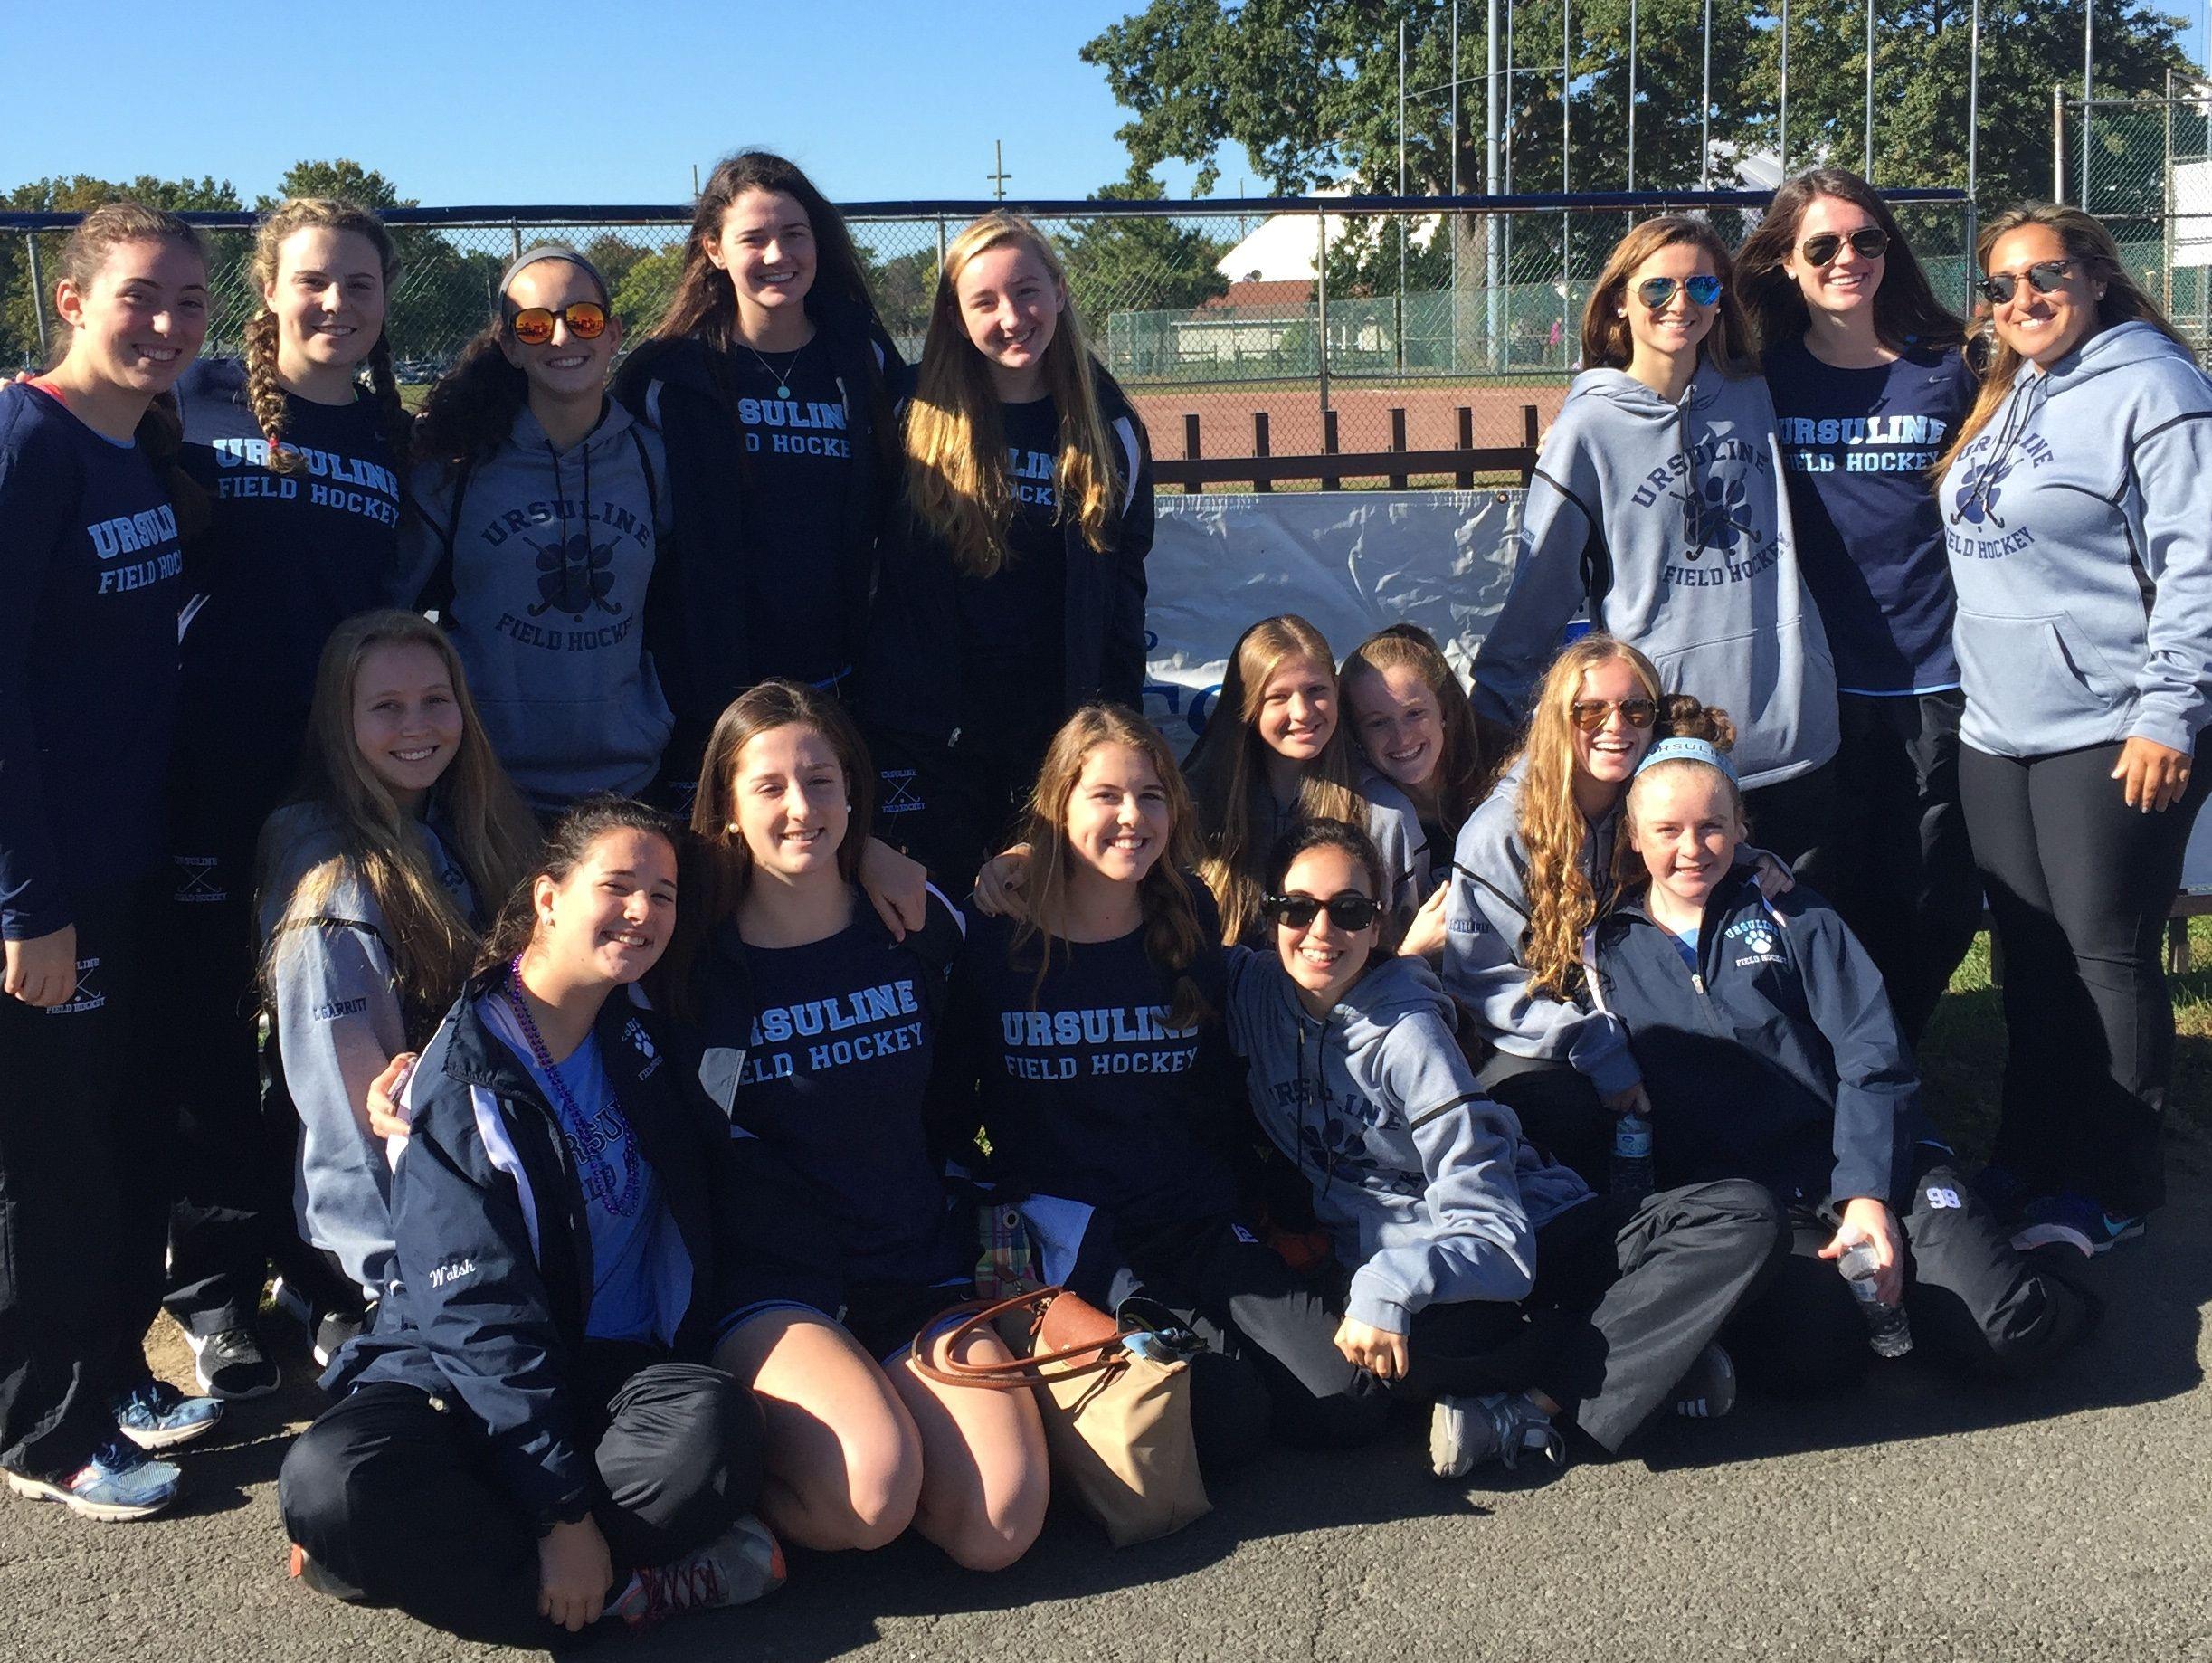 Ursuline field hockey team at Mamaroneck's Long Island Sound harbor for Saturday's suicide prevention walk